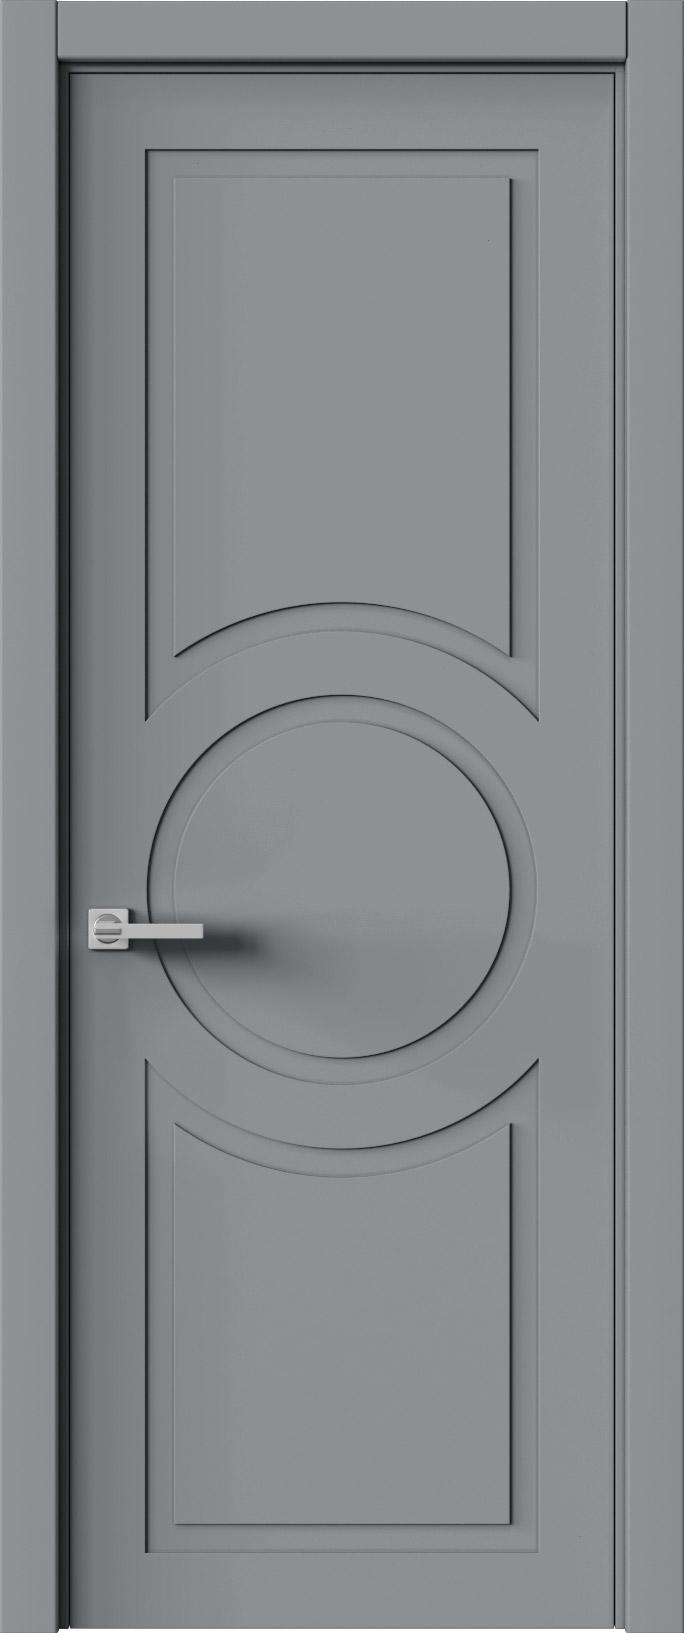 Tivoli М-5 цвет - Серебристо-серая эмаль (RAL 7045) Без стекла (ДГ)